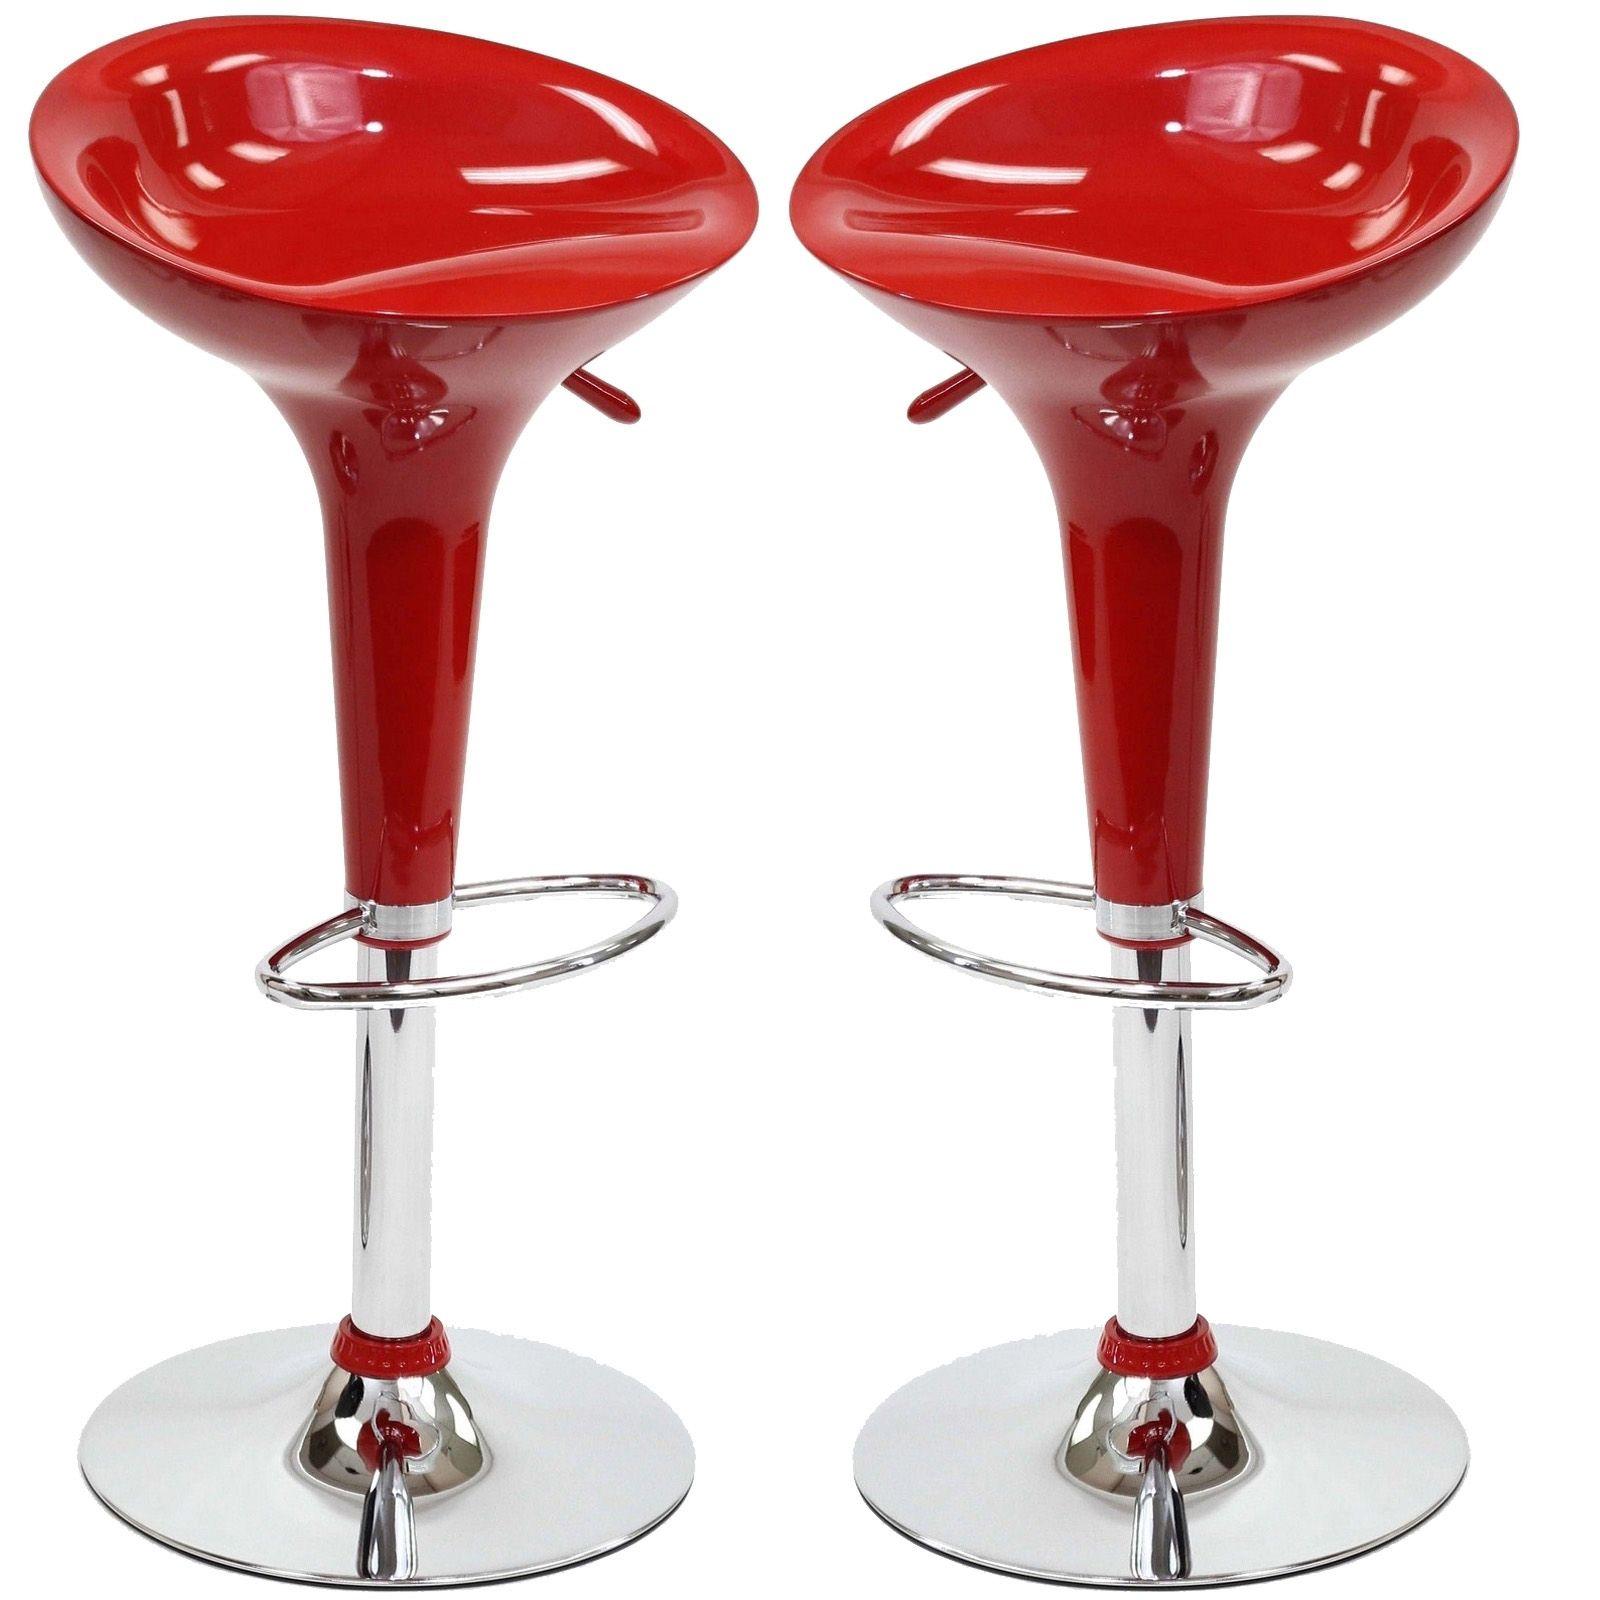 Bar Stools Cream Bar Stools Bar Stools Red Bar Stools